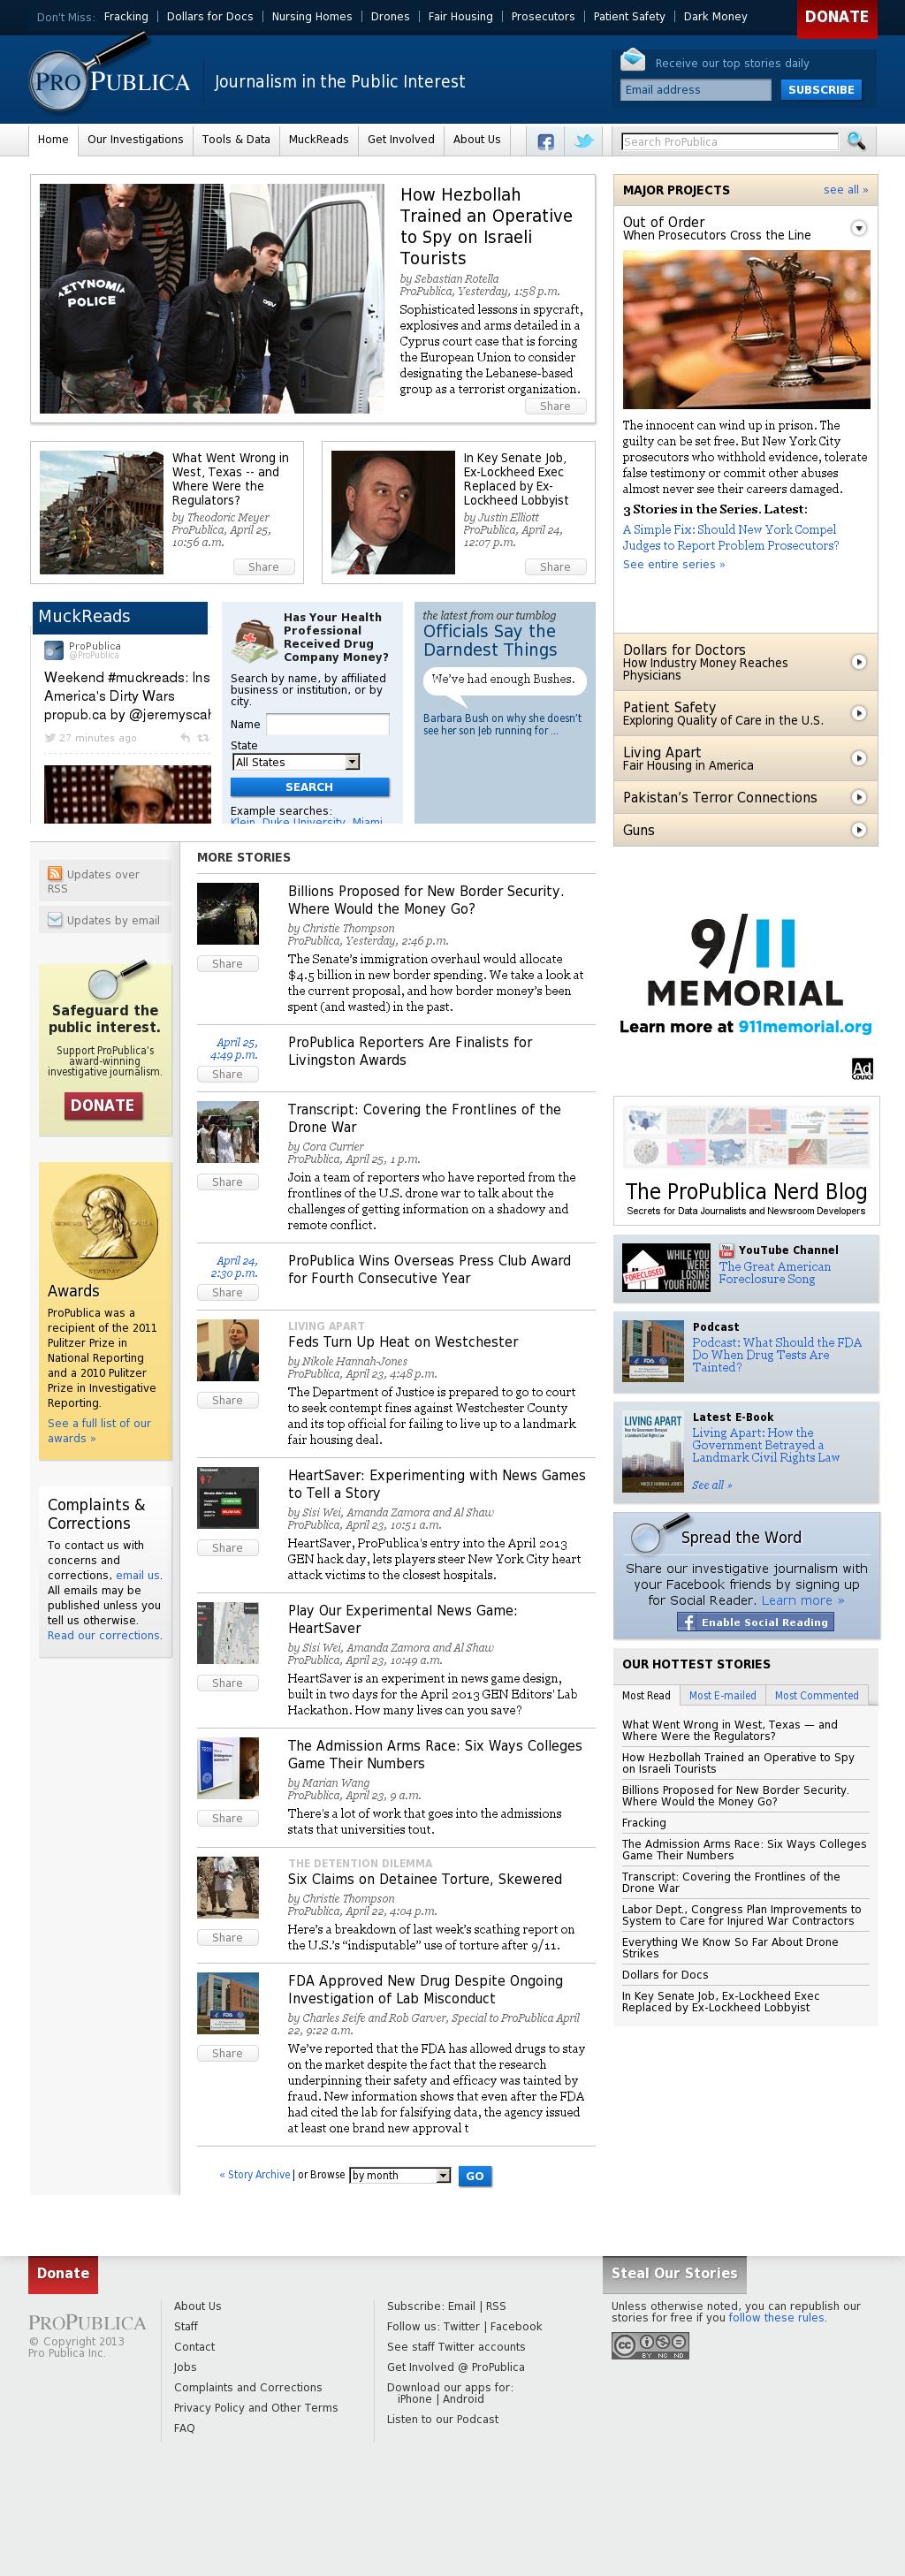 ProPublica at Saturday April 27, 2013, 5:19 p.m. UTC